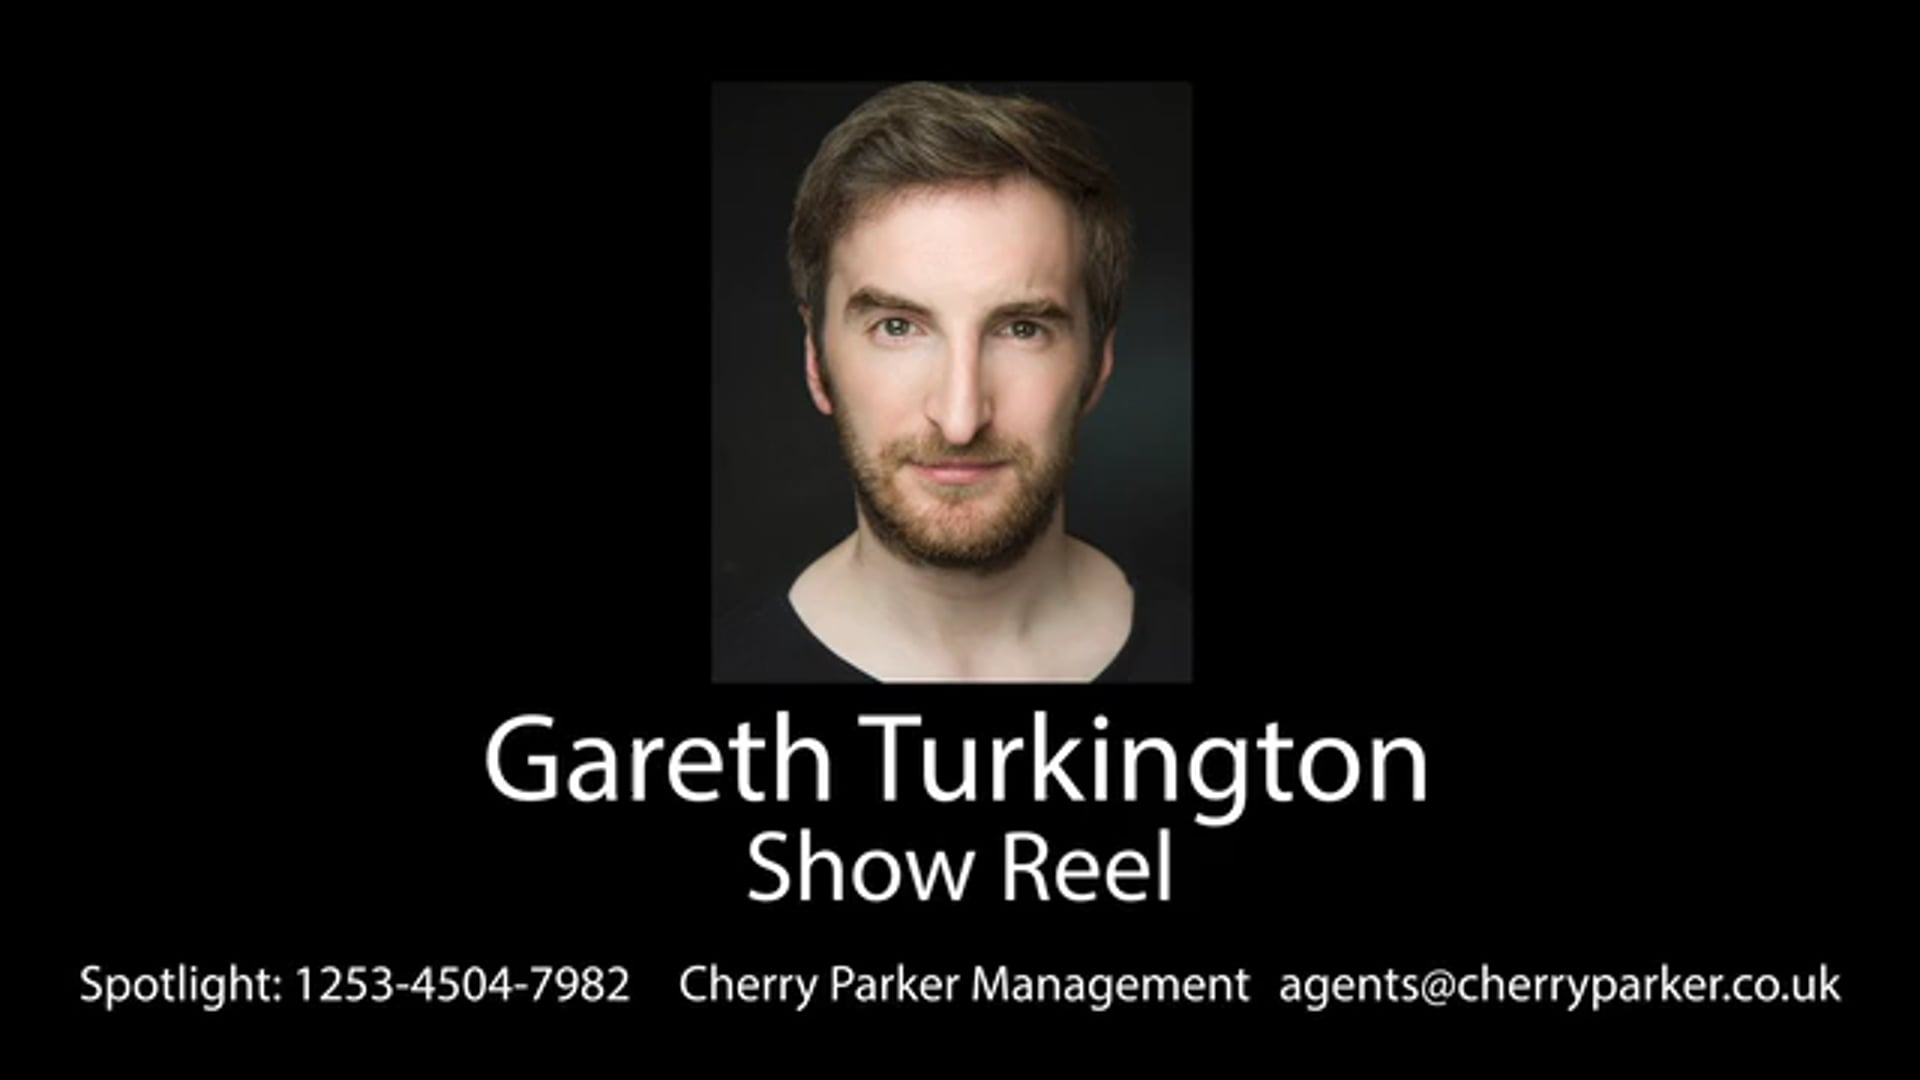 GARETH TURKINGTON- Show Reel